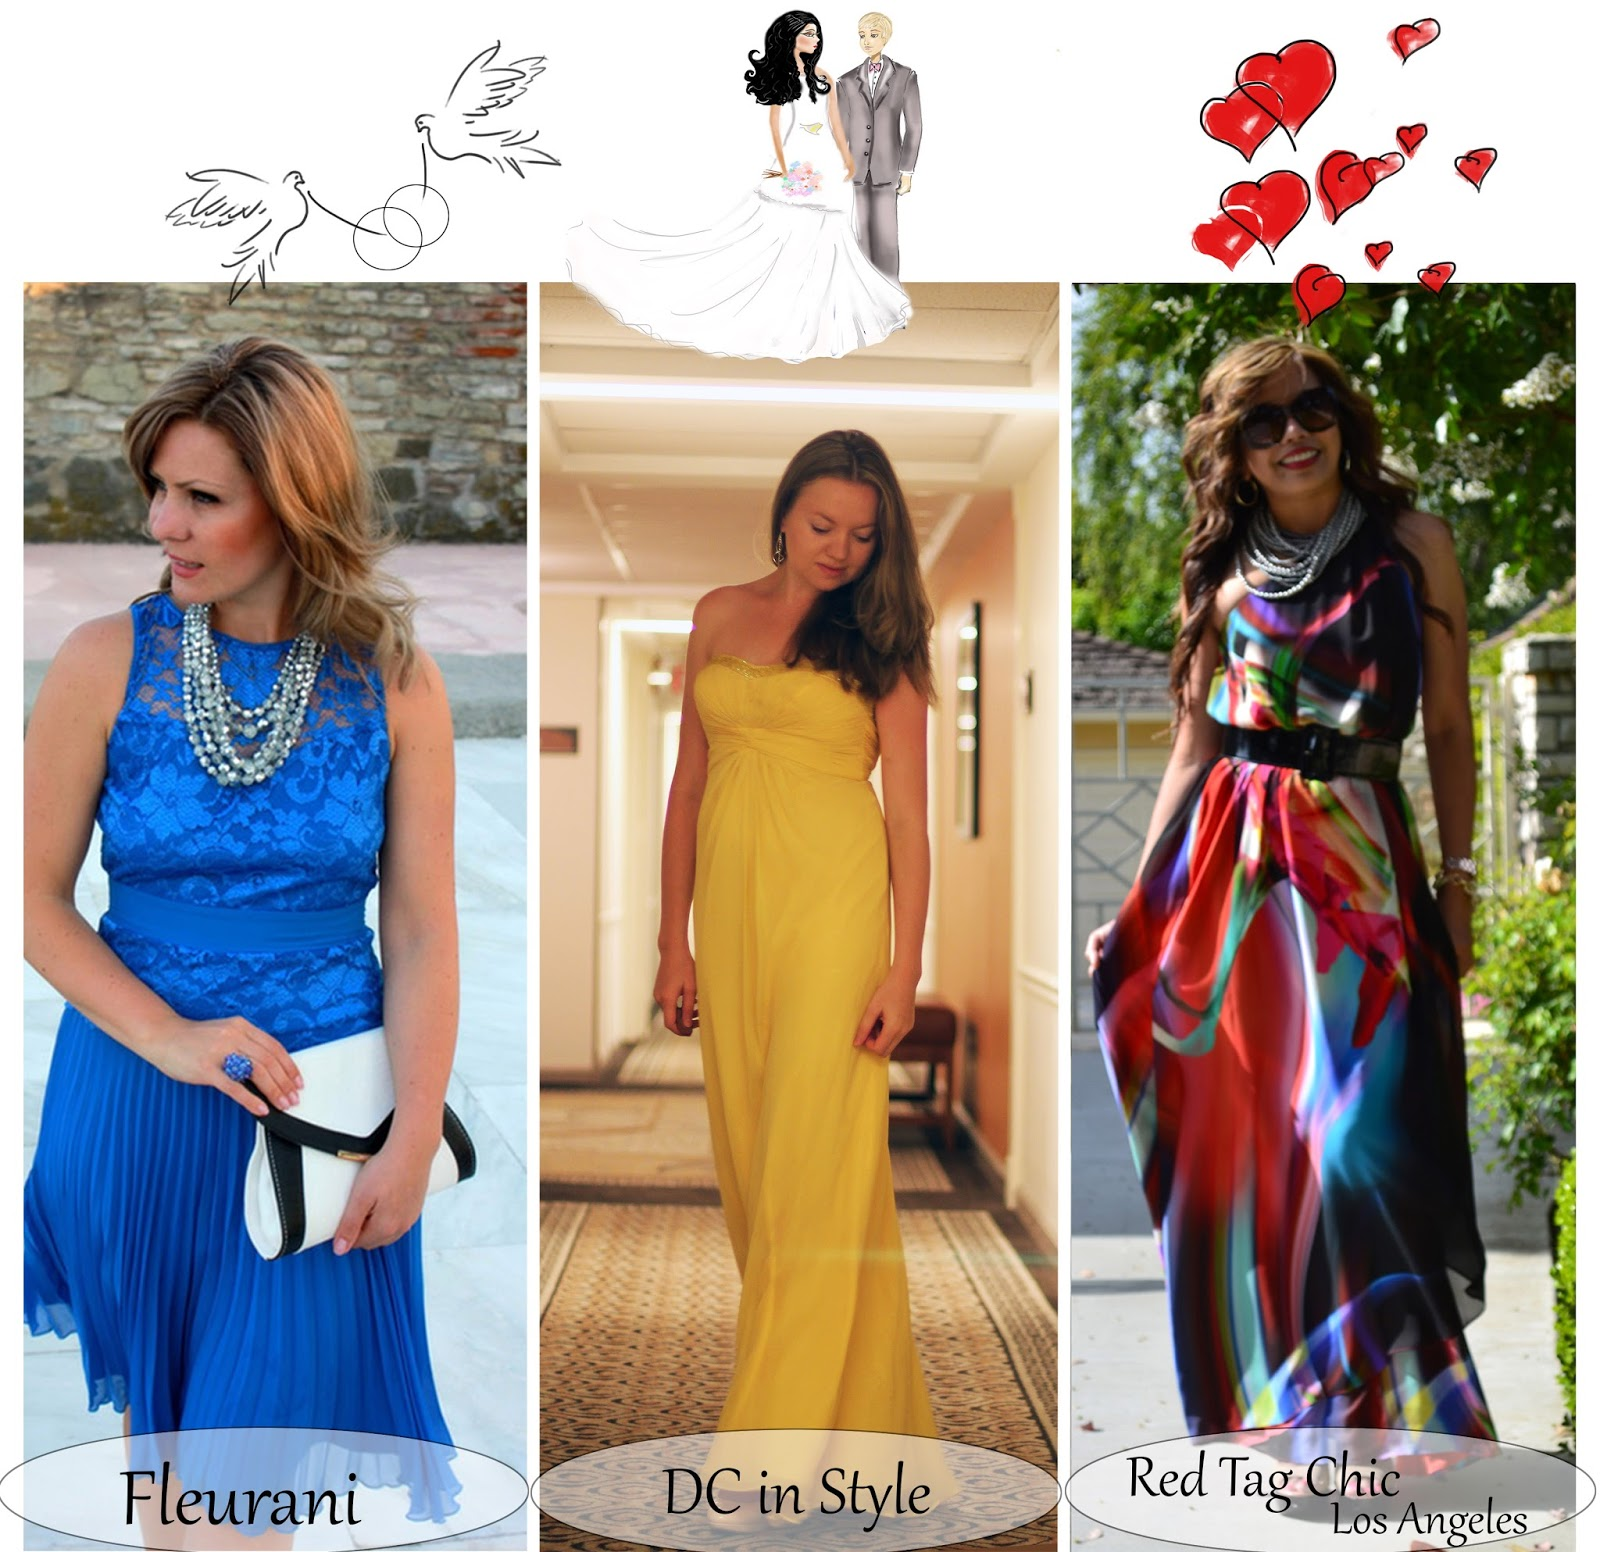 fleurani: Monday Bloom Link up on Fall Wedding guest attire - Photo ...